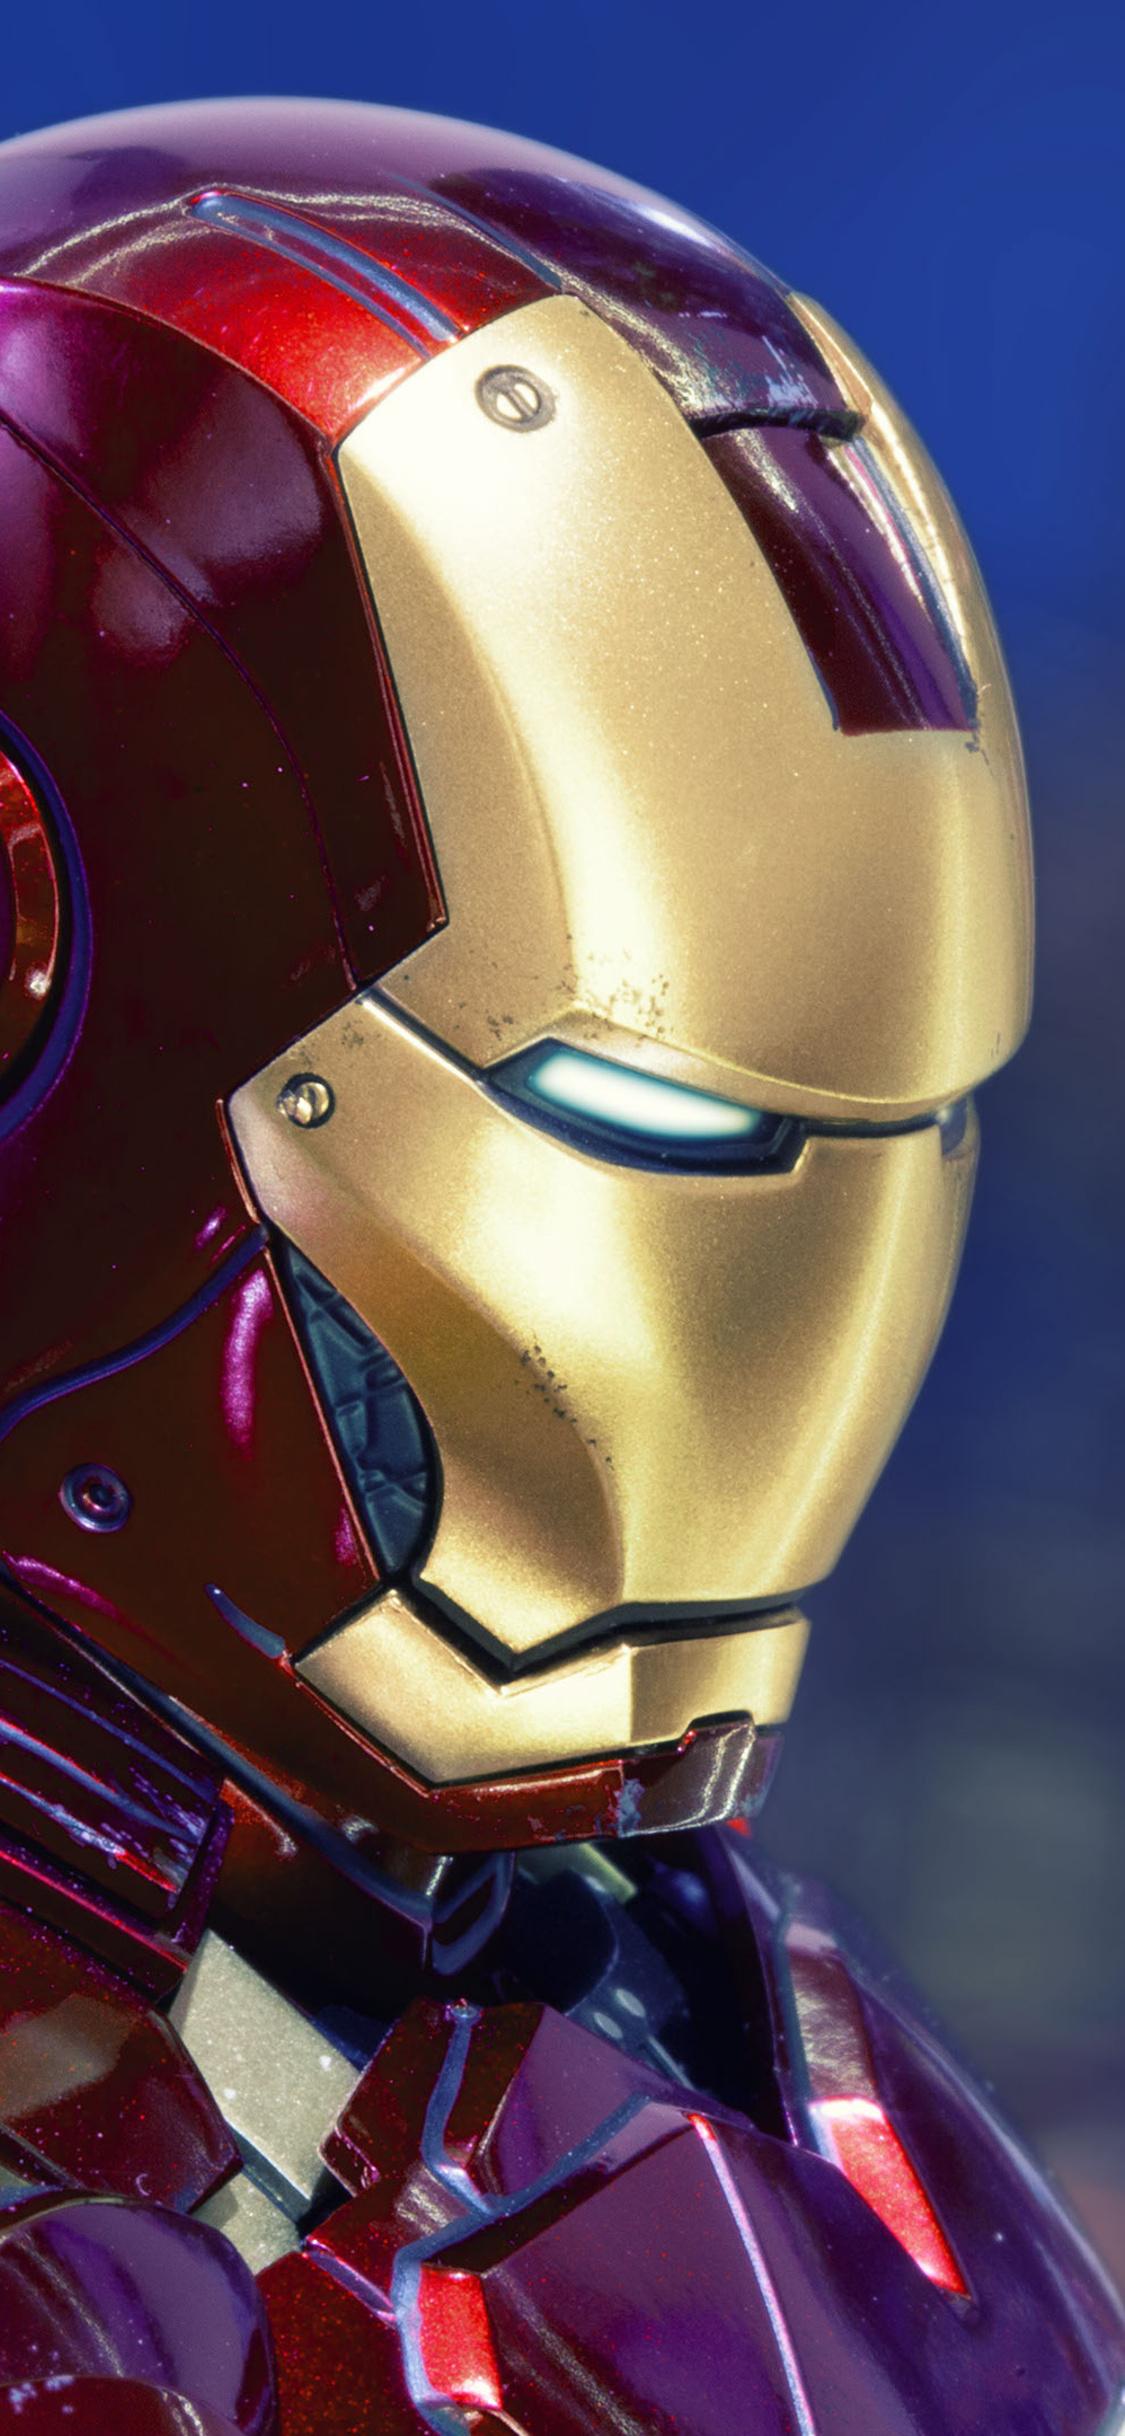 iron-man-thoughts-4k-yc.jpg